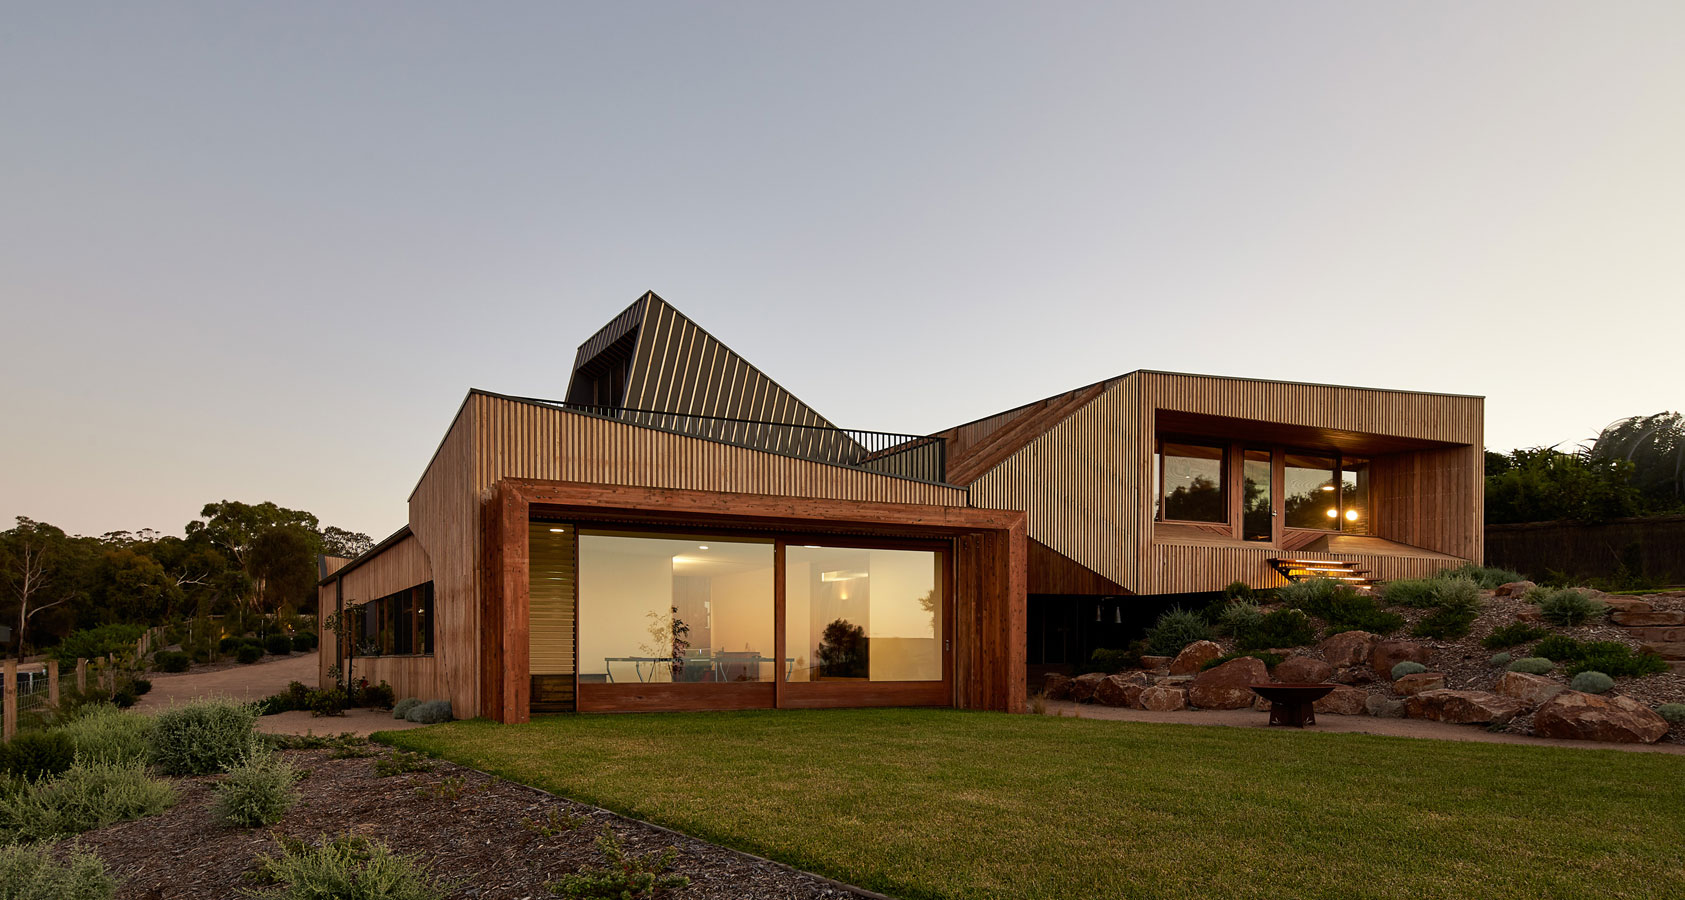 Overend Constructions, Split House, full exterior view at dusk, glass sliding doors, timber cladding, landscaped garden, BKK Architects